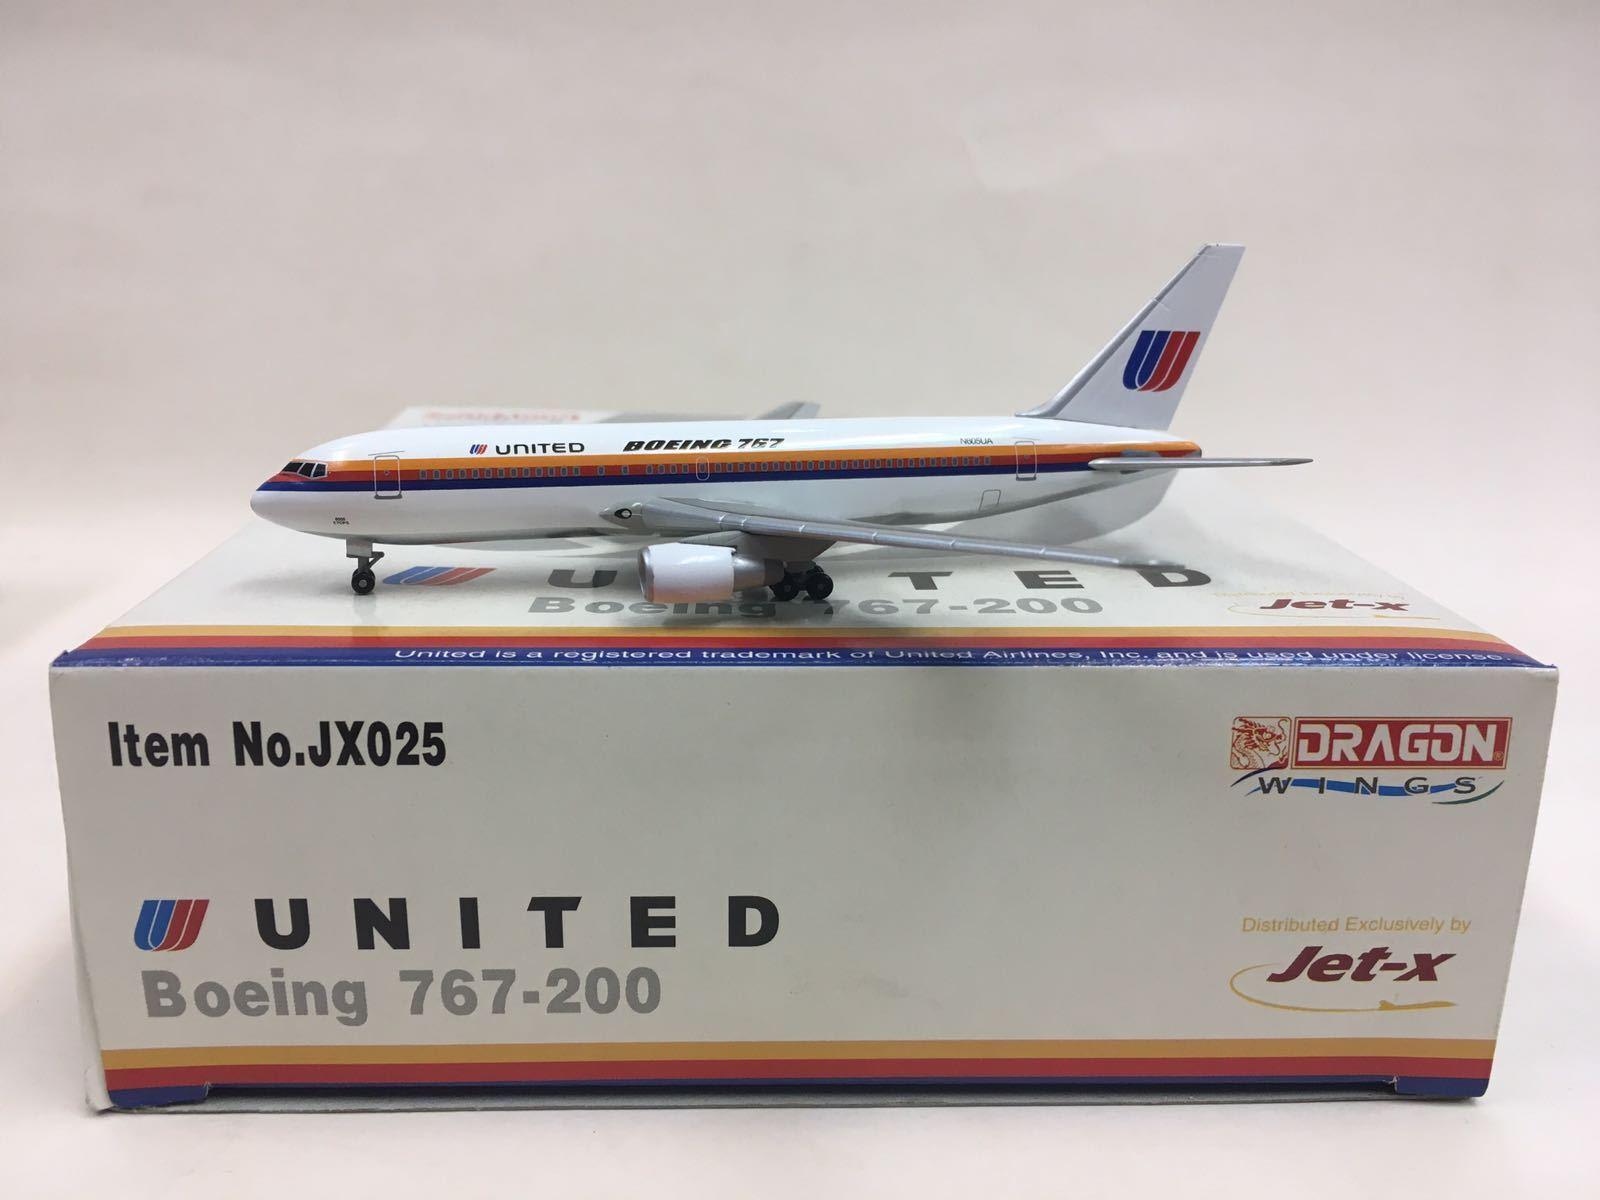 Alas de dragón Jet-x United Airlines Boeing 767-200 1 400 JX025 N605UA